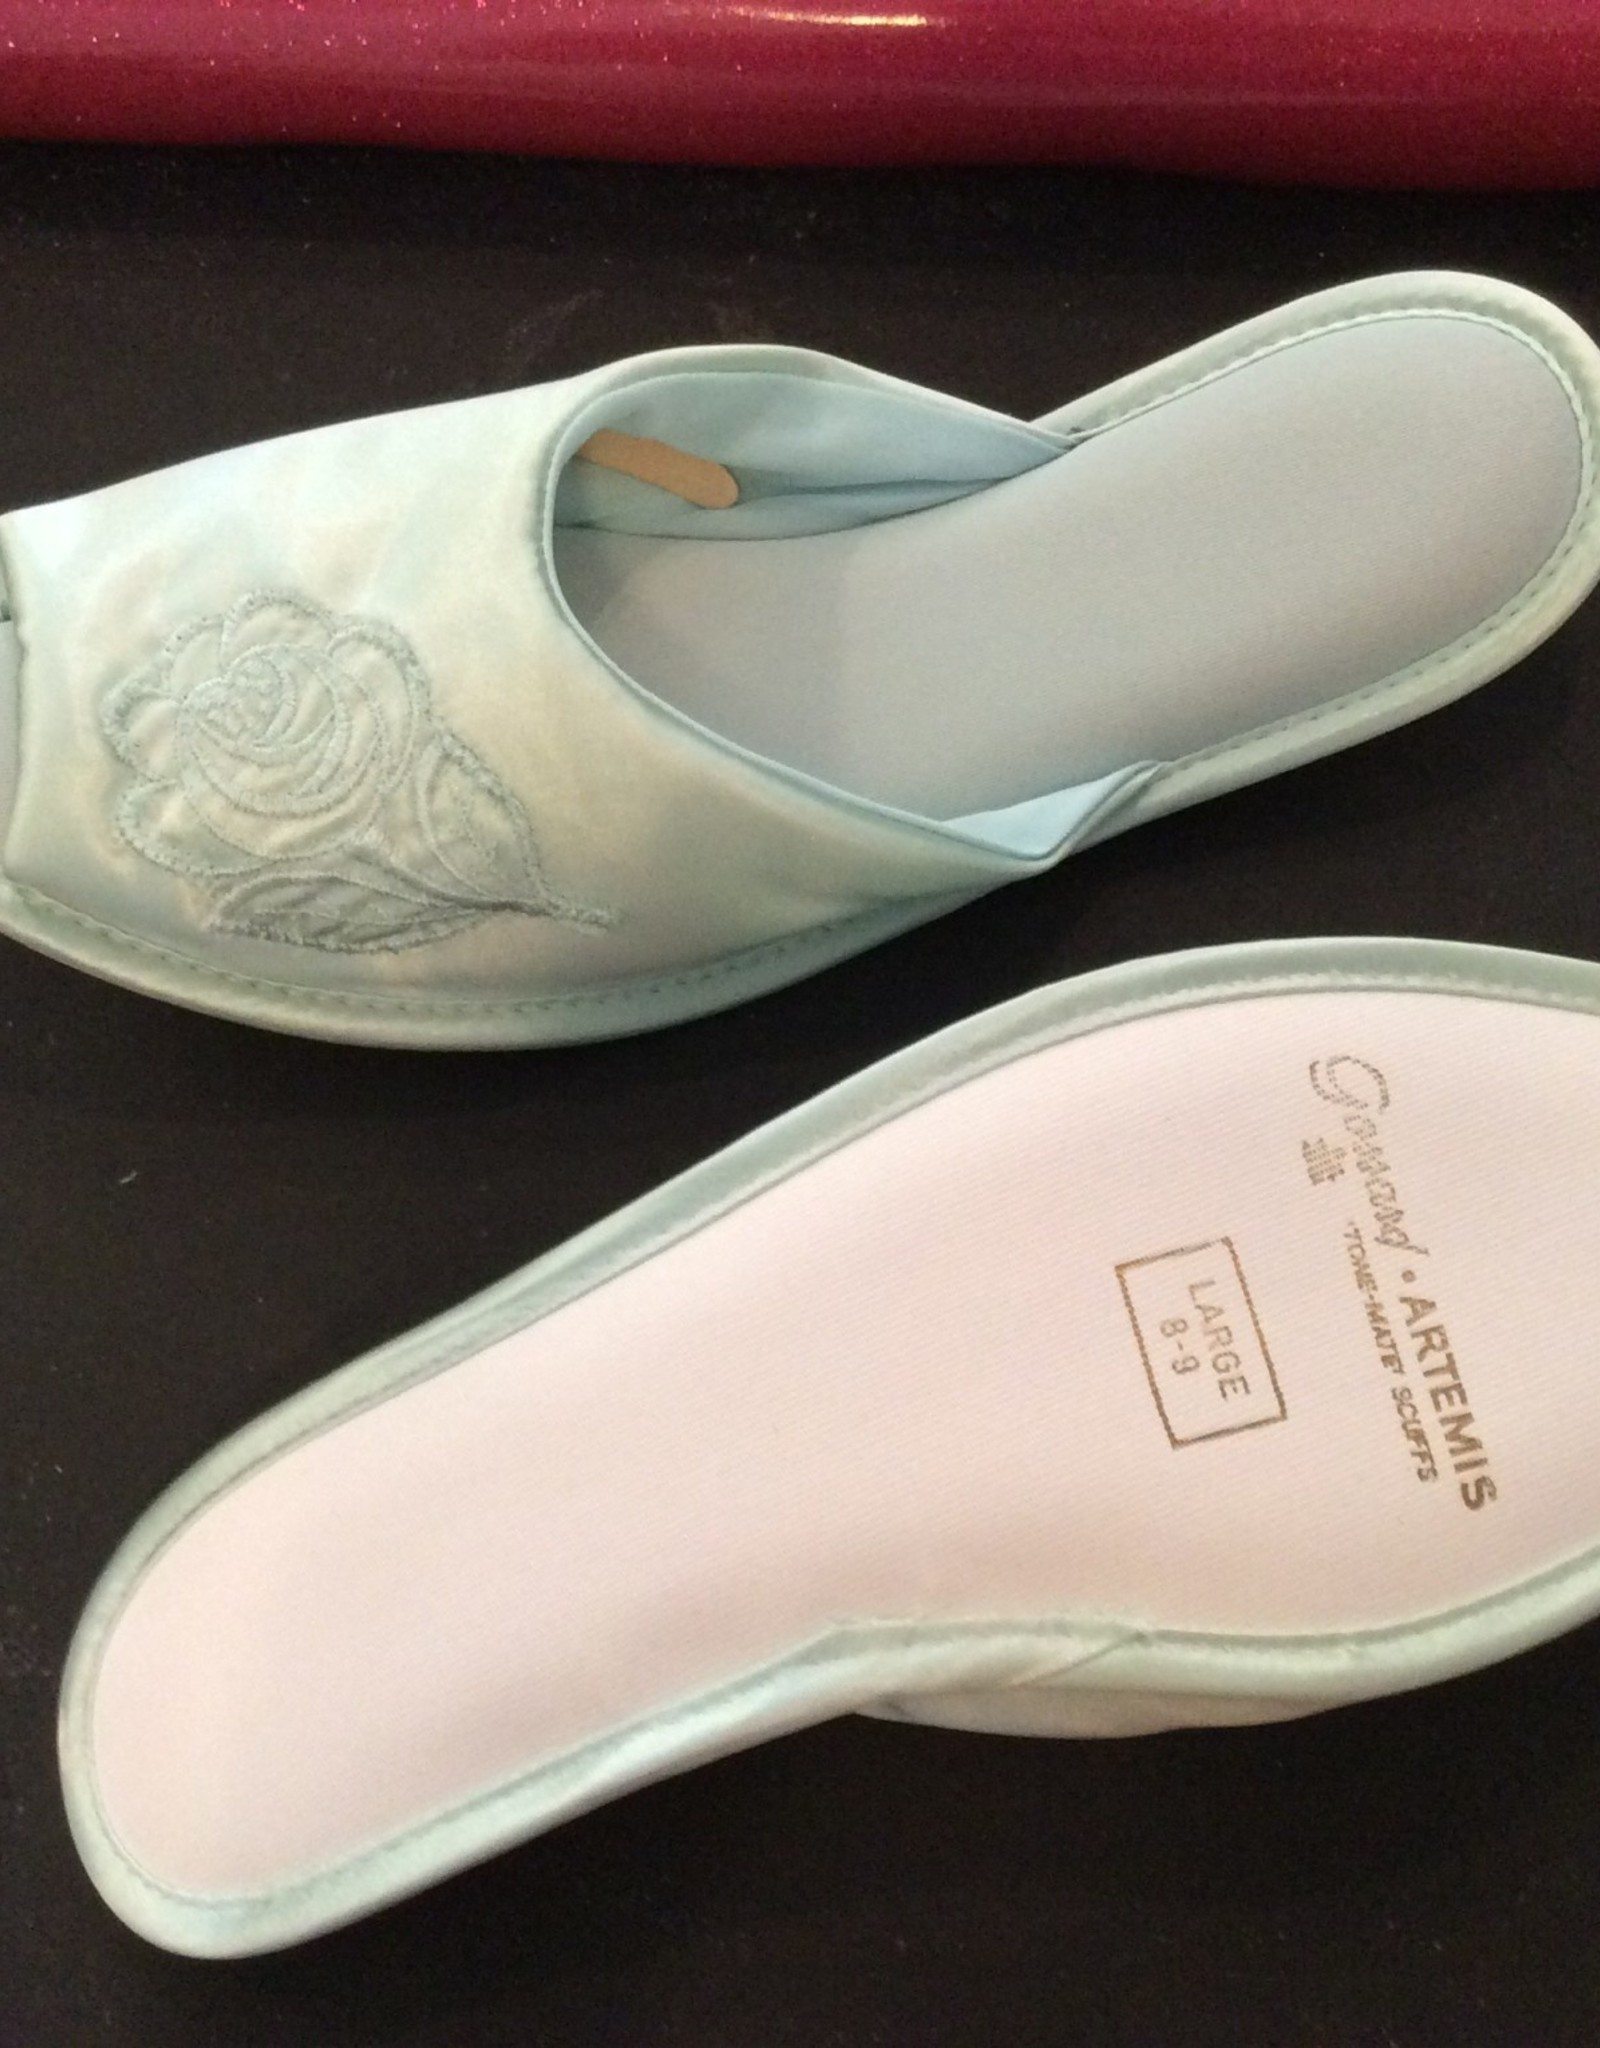 Gossard artemis Gossard 90's nightie and slipper set